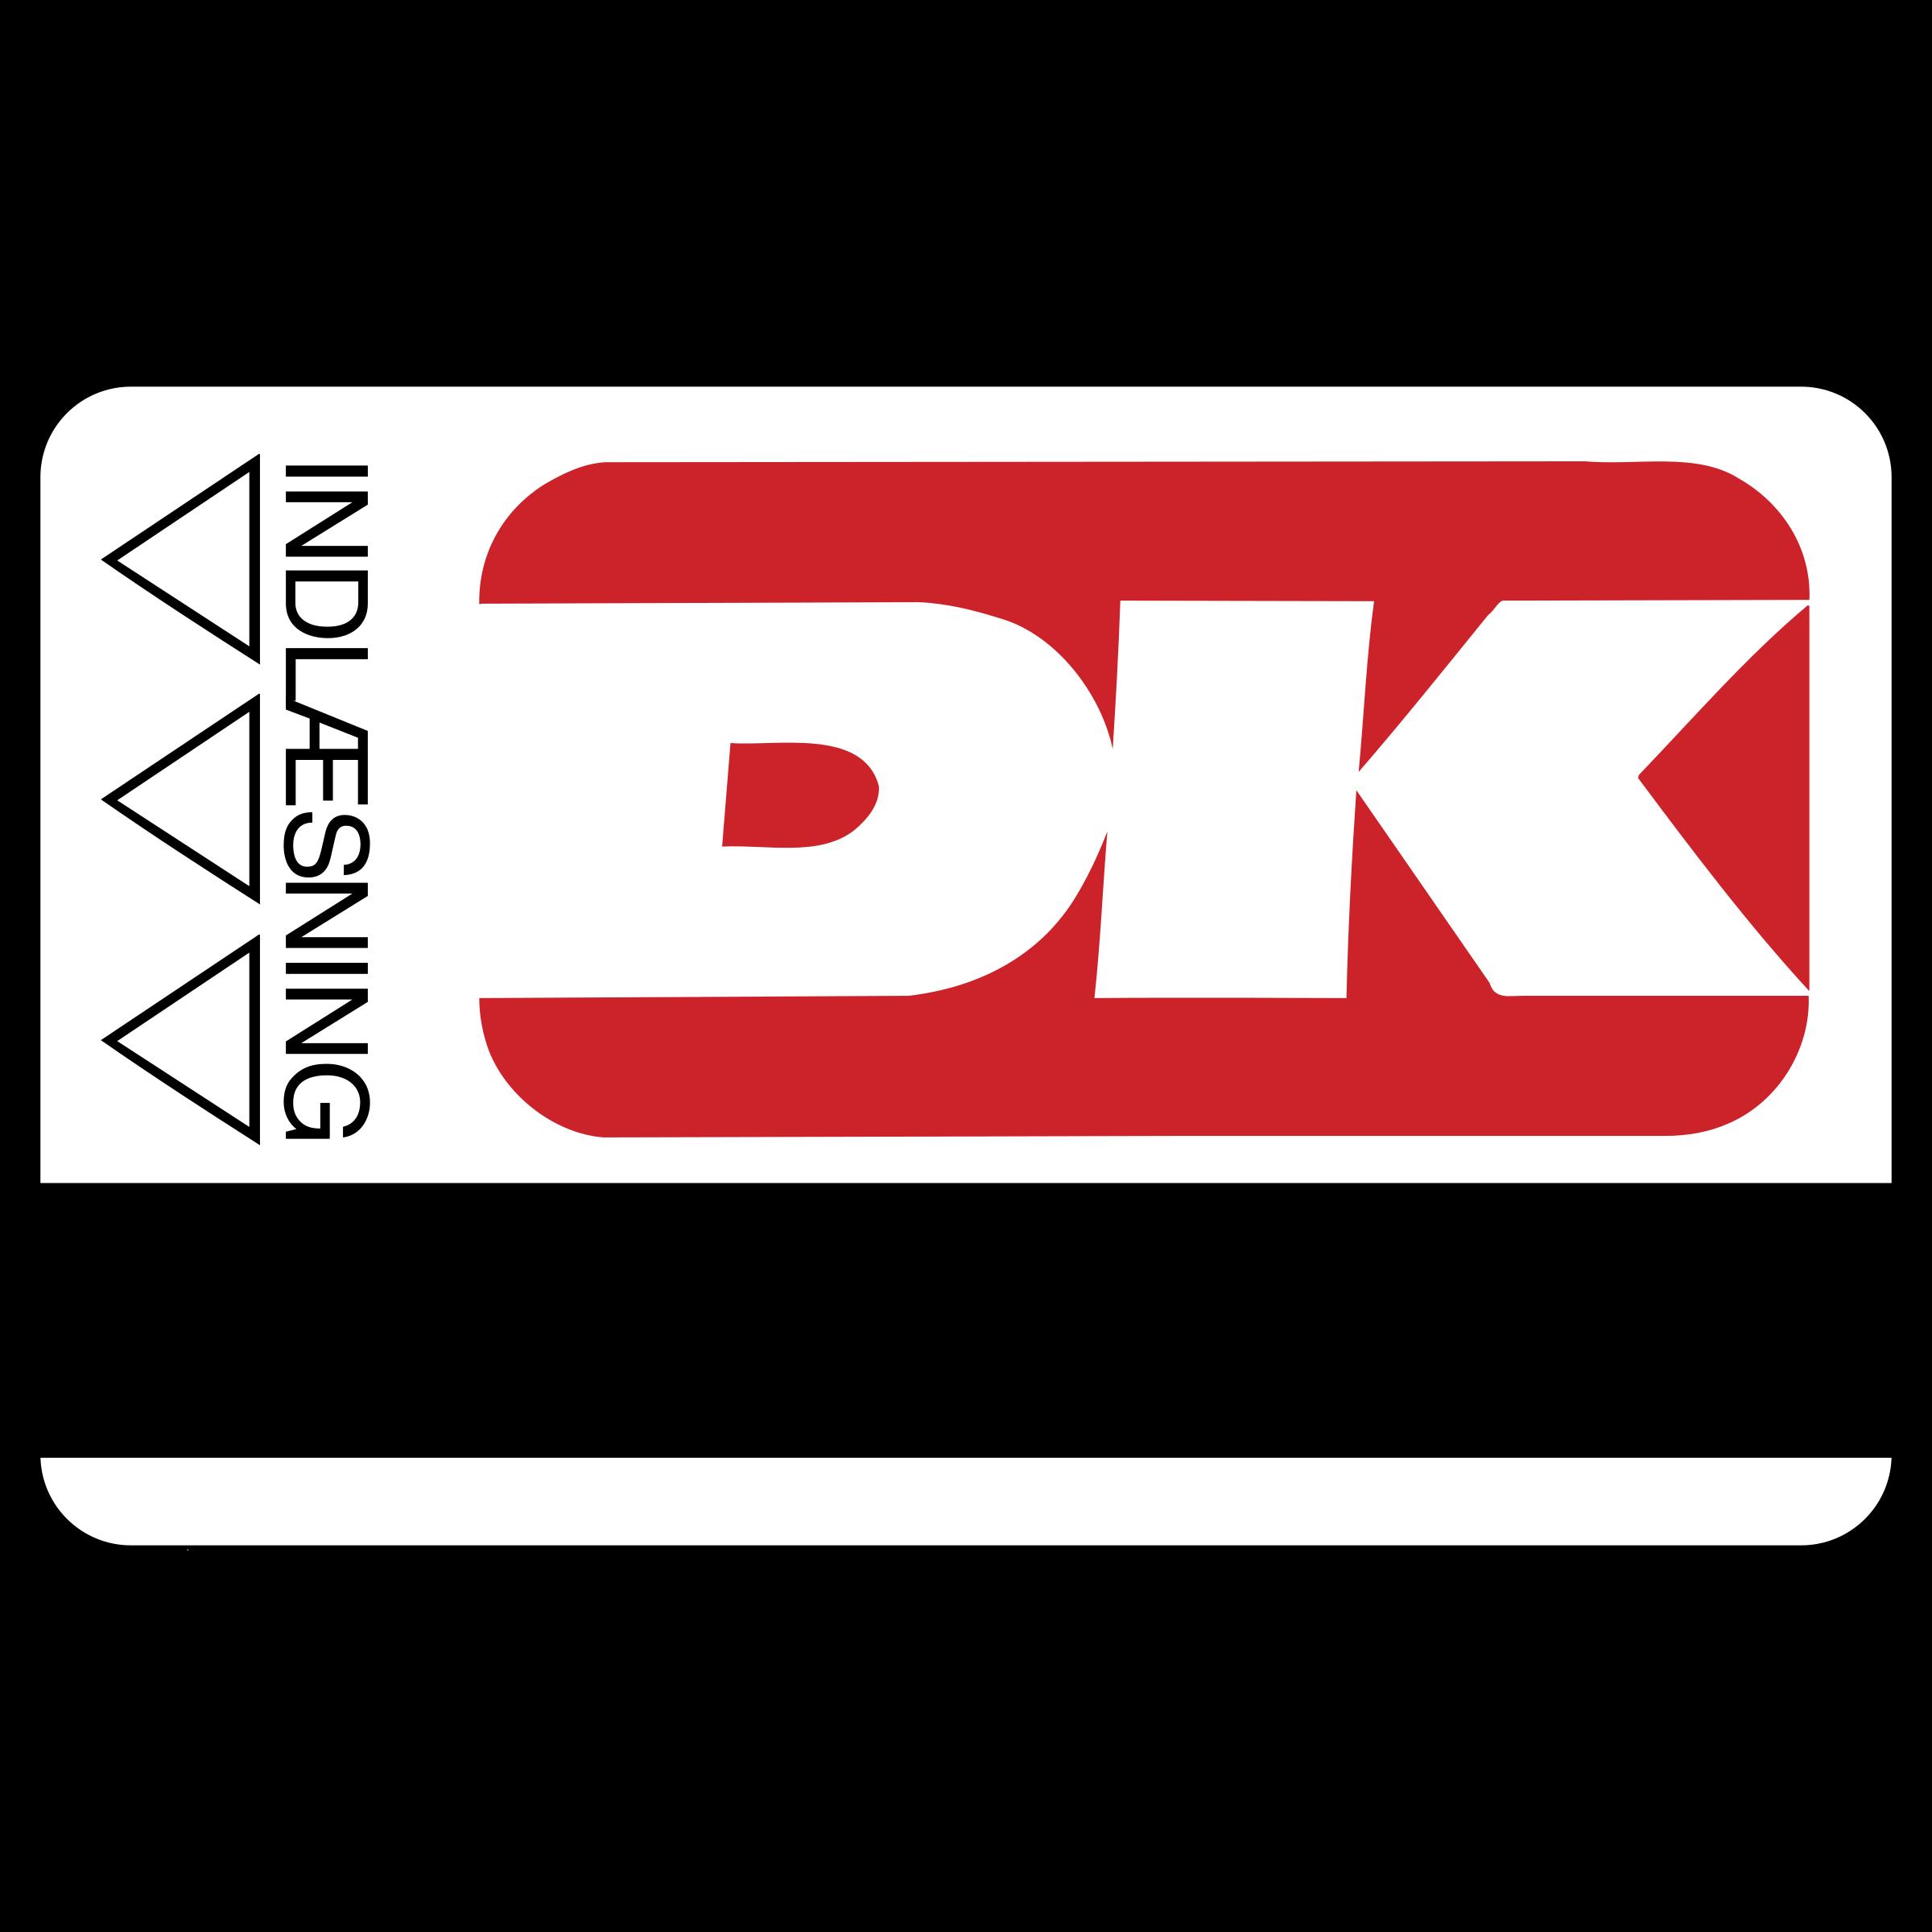 Dankort Logo png transparent